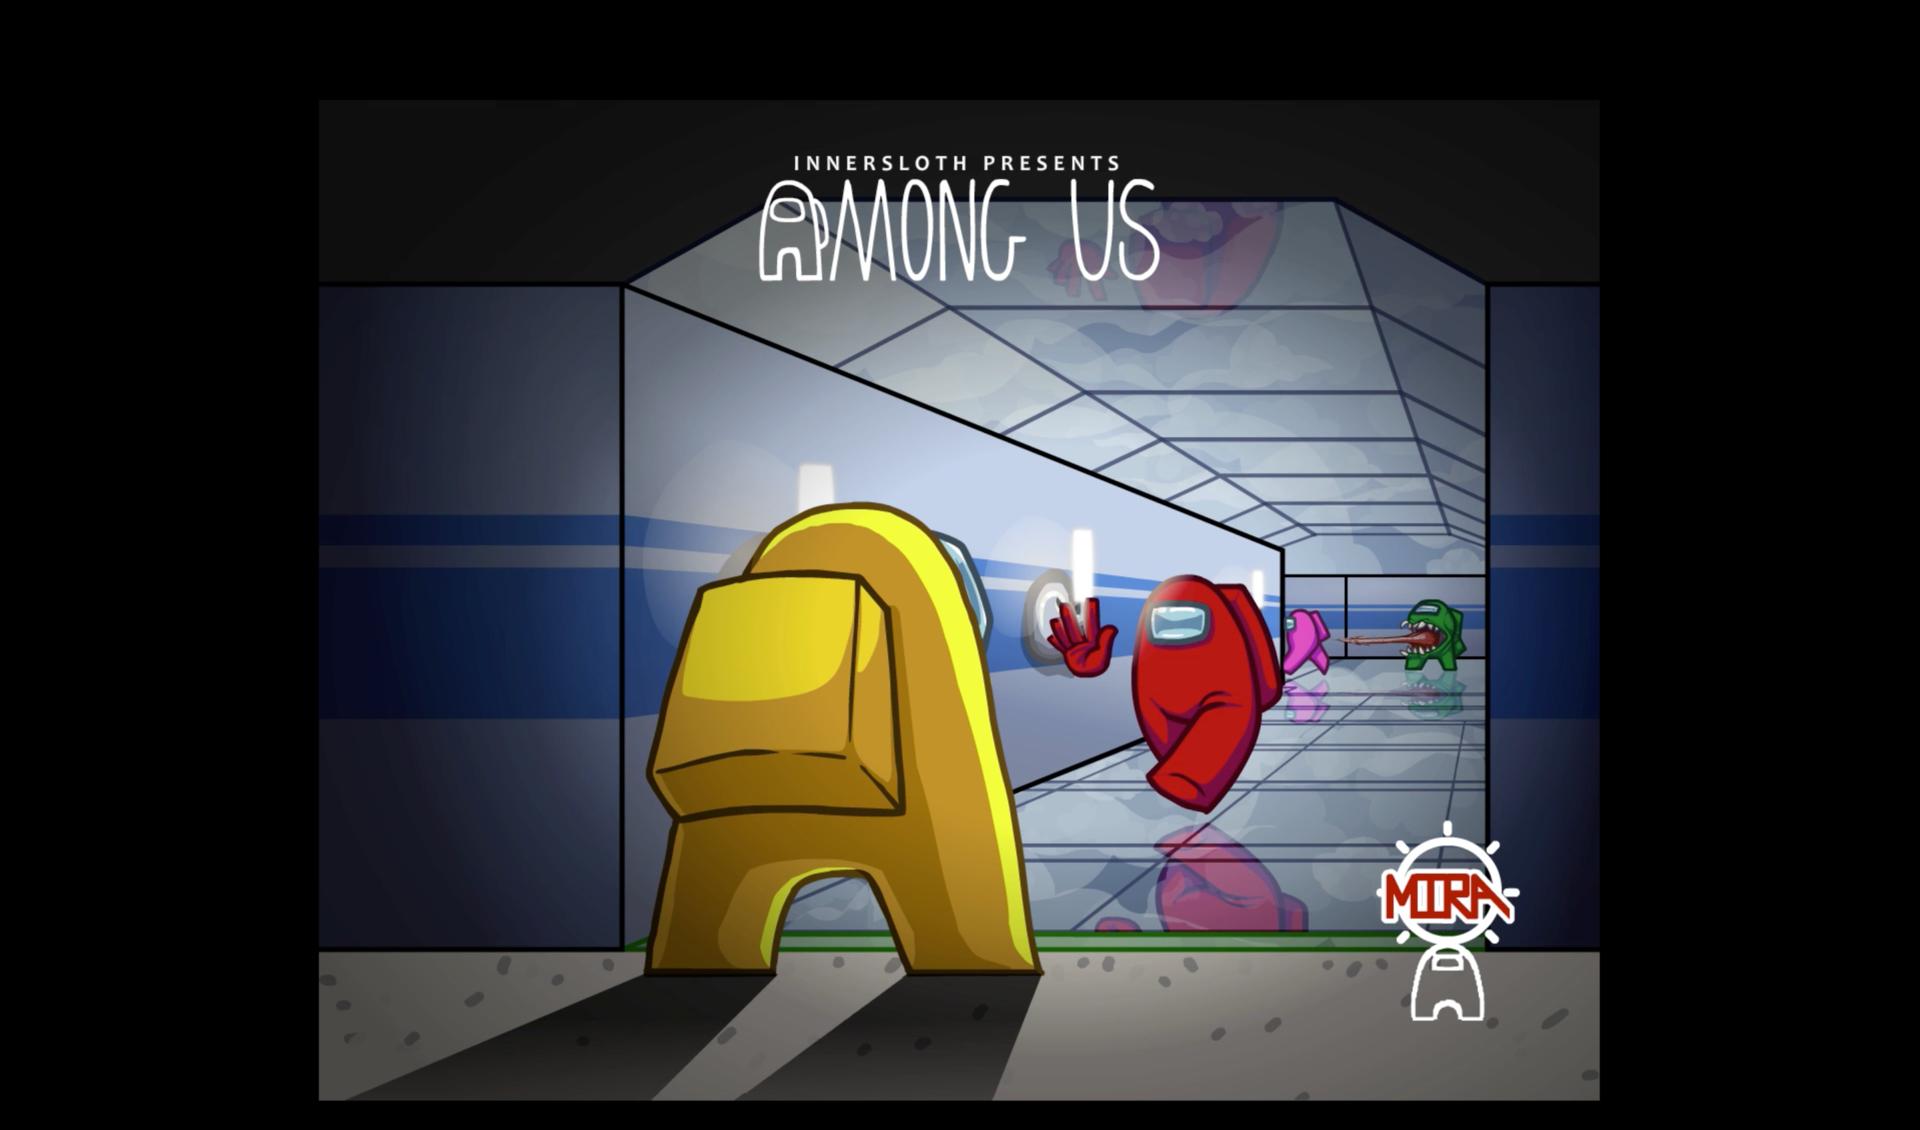 《Among Us》火爆全球,ZEGO即构游戏语音助力派对游戏开启第二春